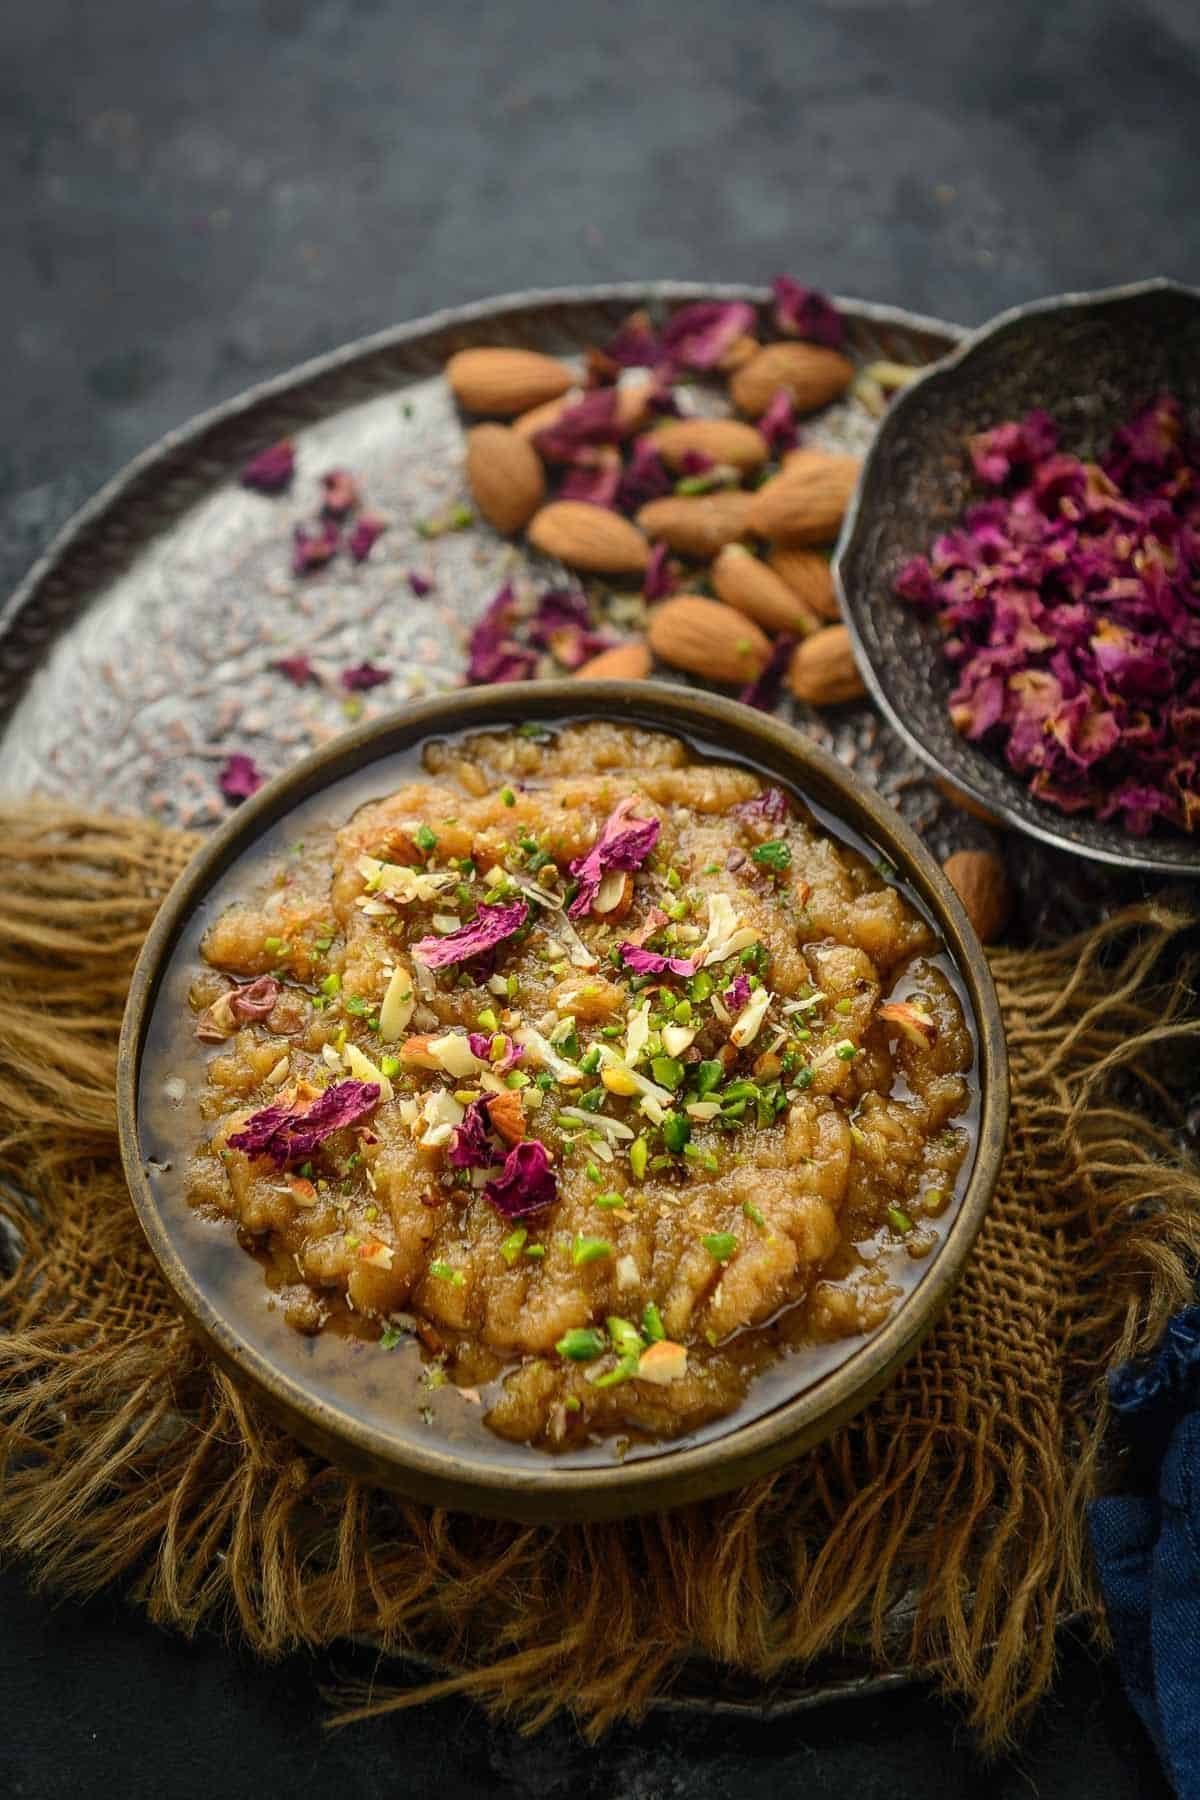 Rajgira halwa served in a bowl.